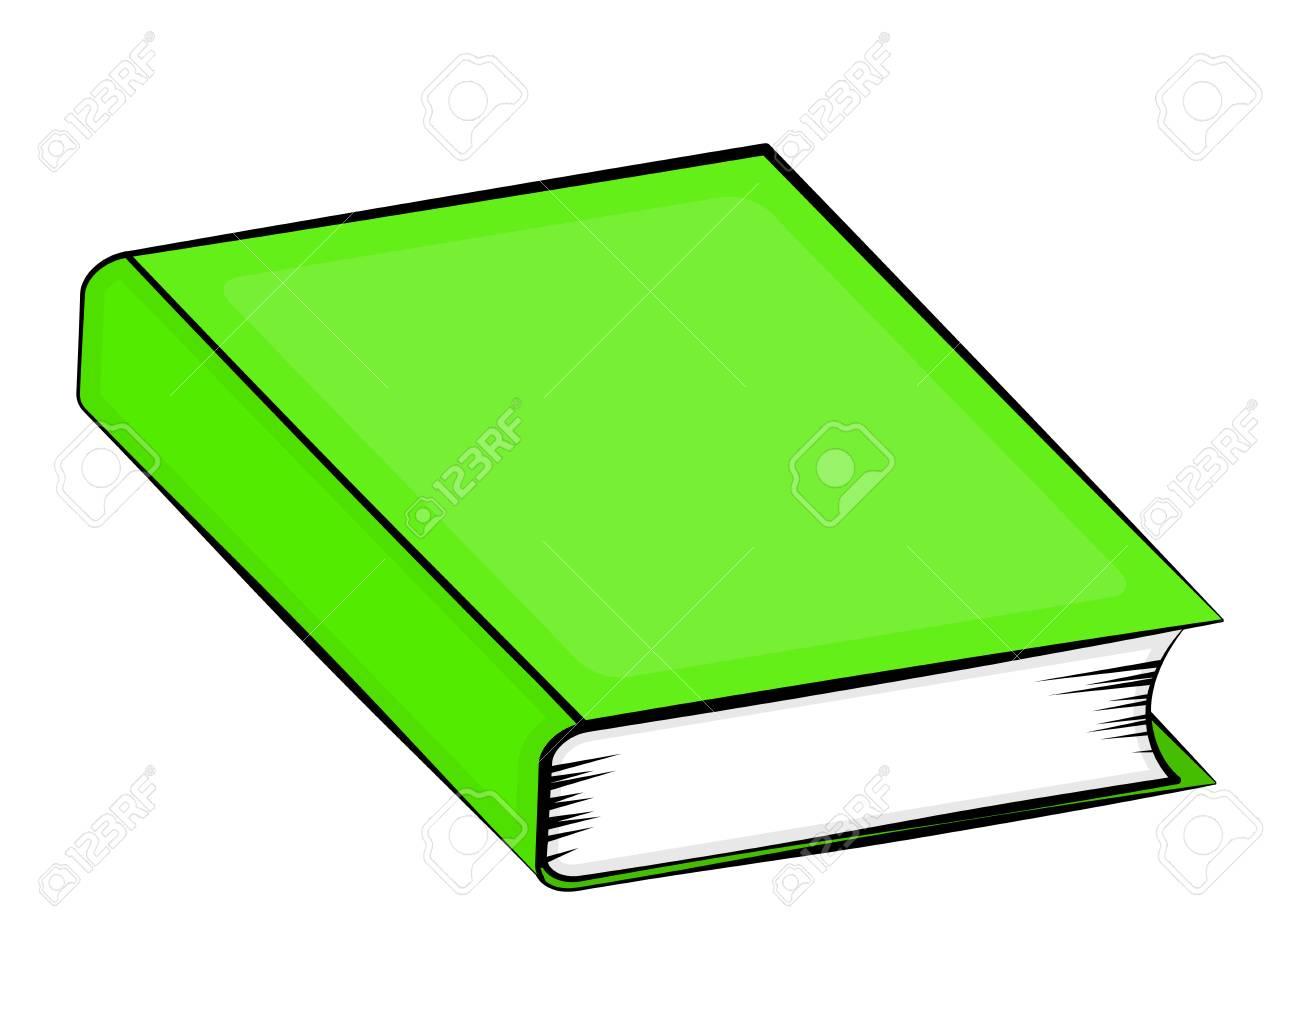 Geschlossenes Buch Cartoon Vektor Symbol Icon Design. Schöne ...